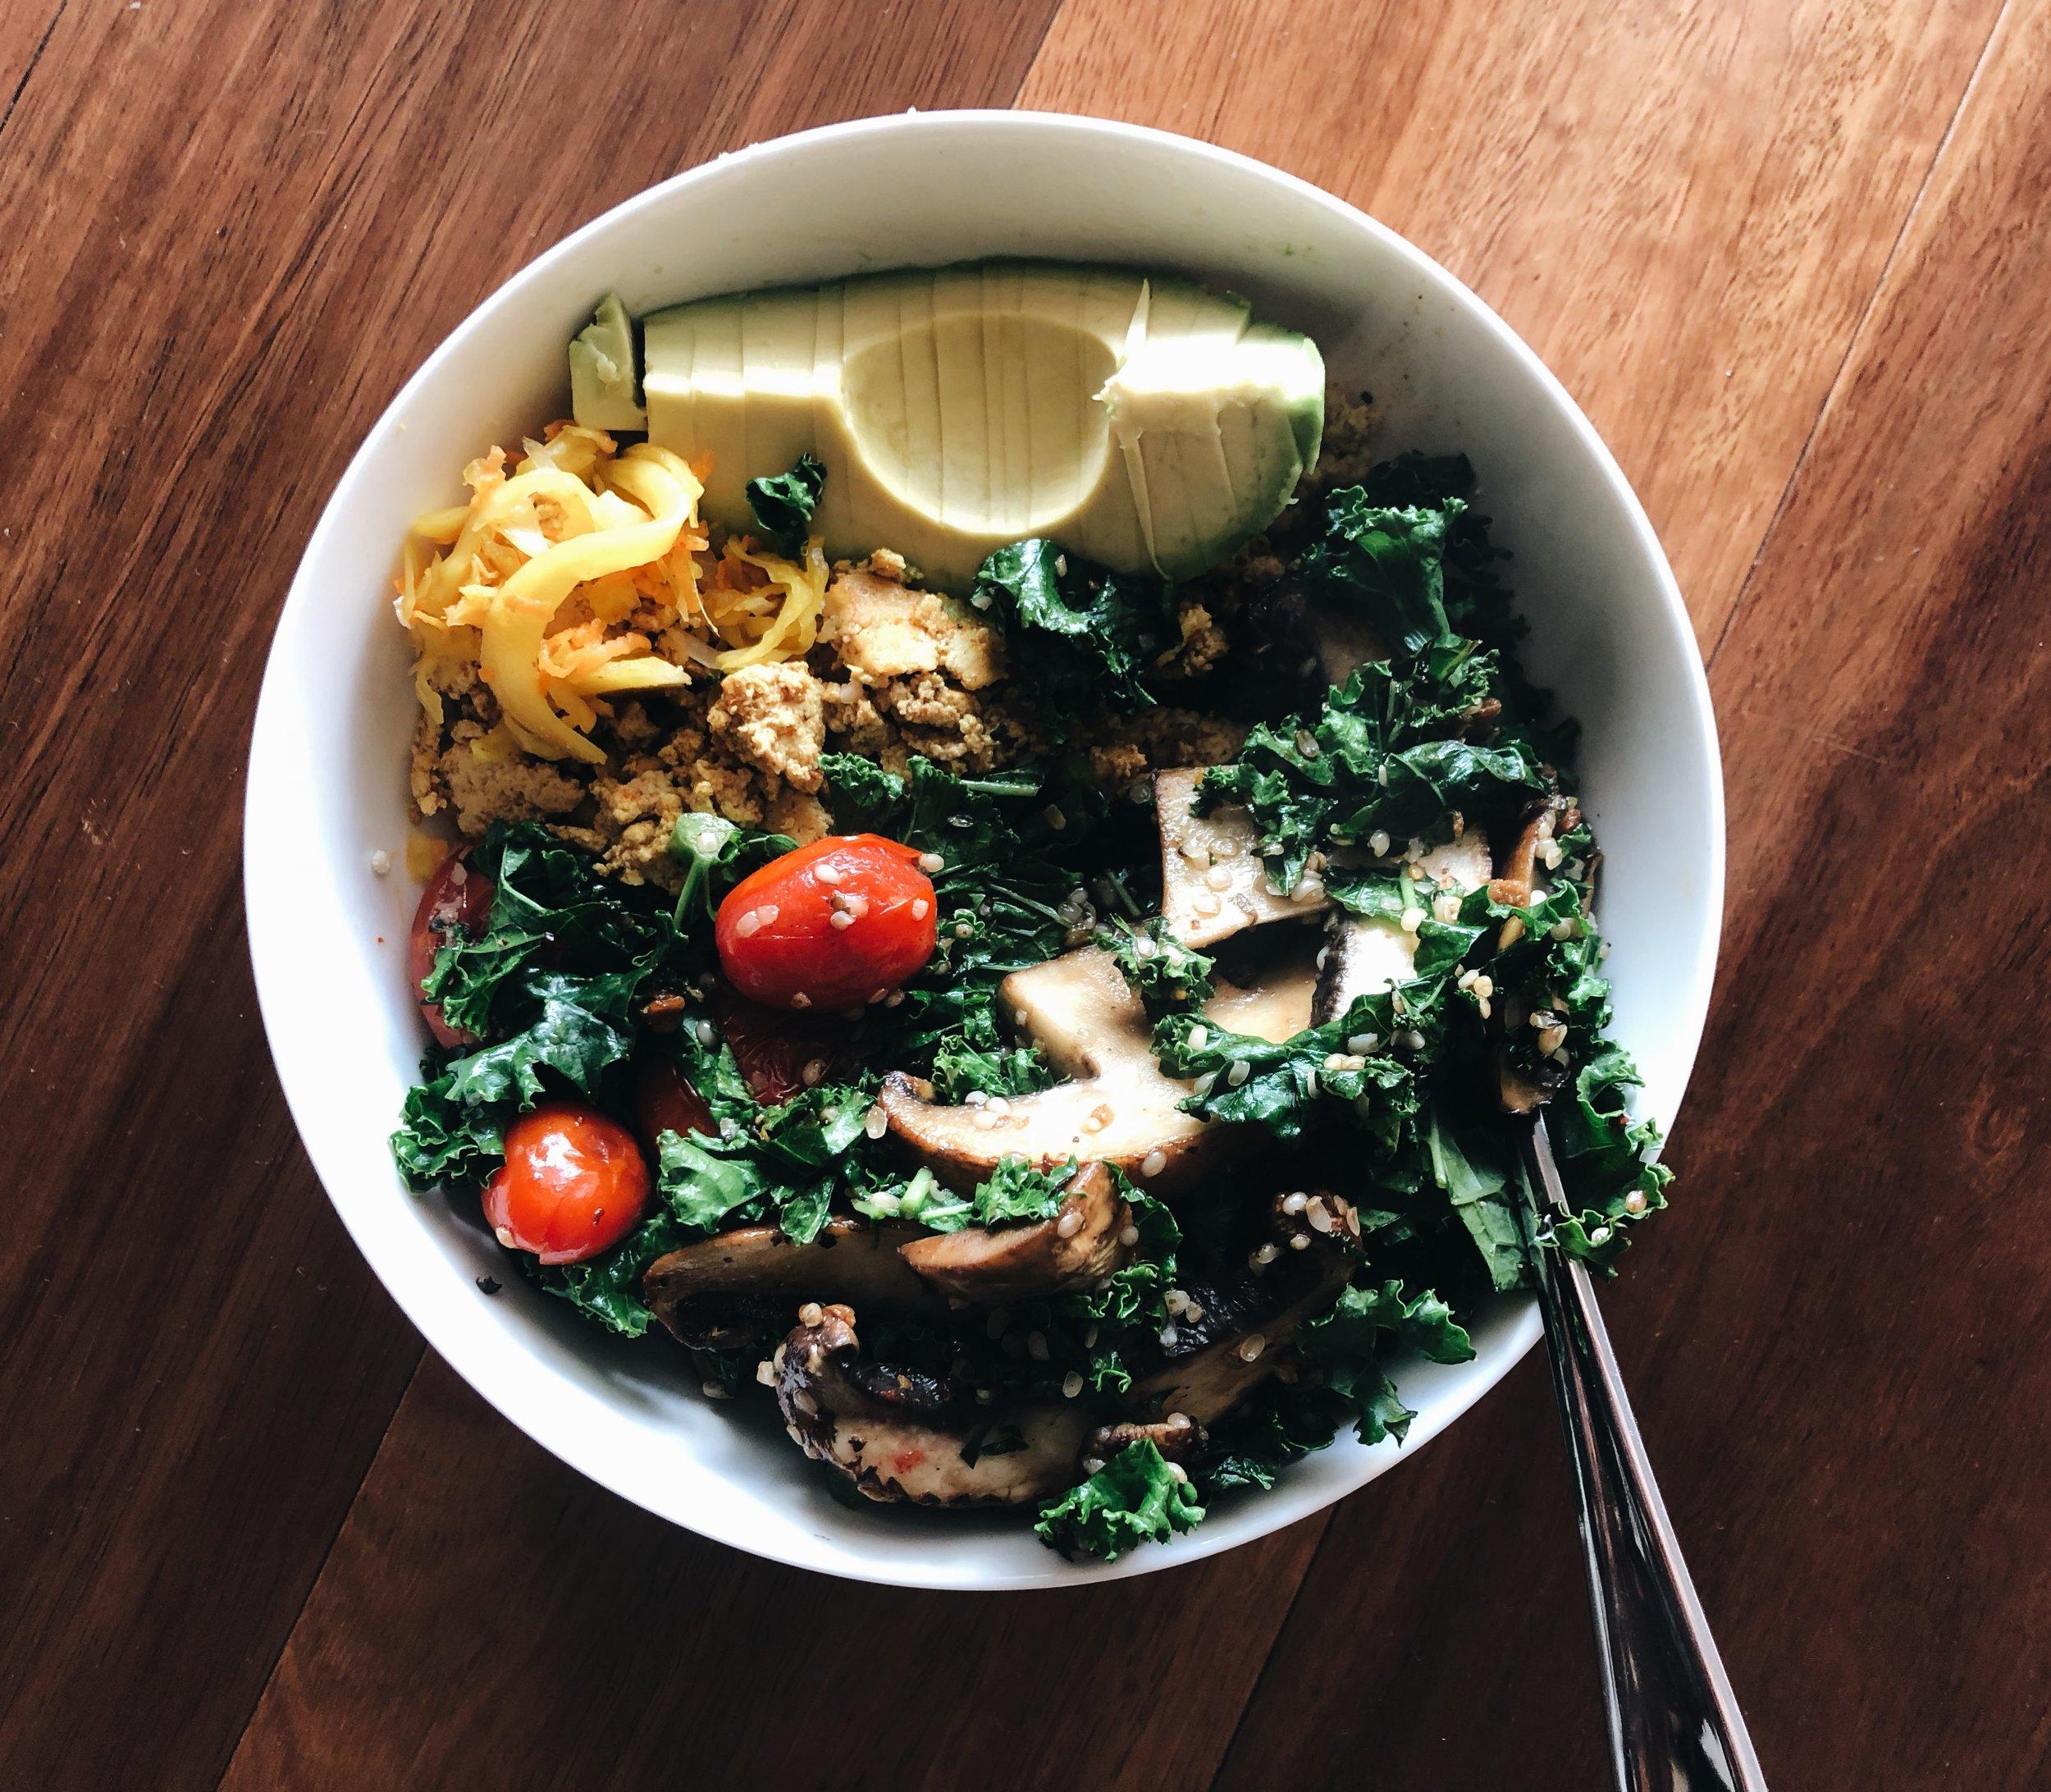 Tofu Scramble - with sautéed veg